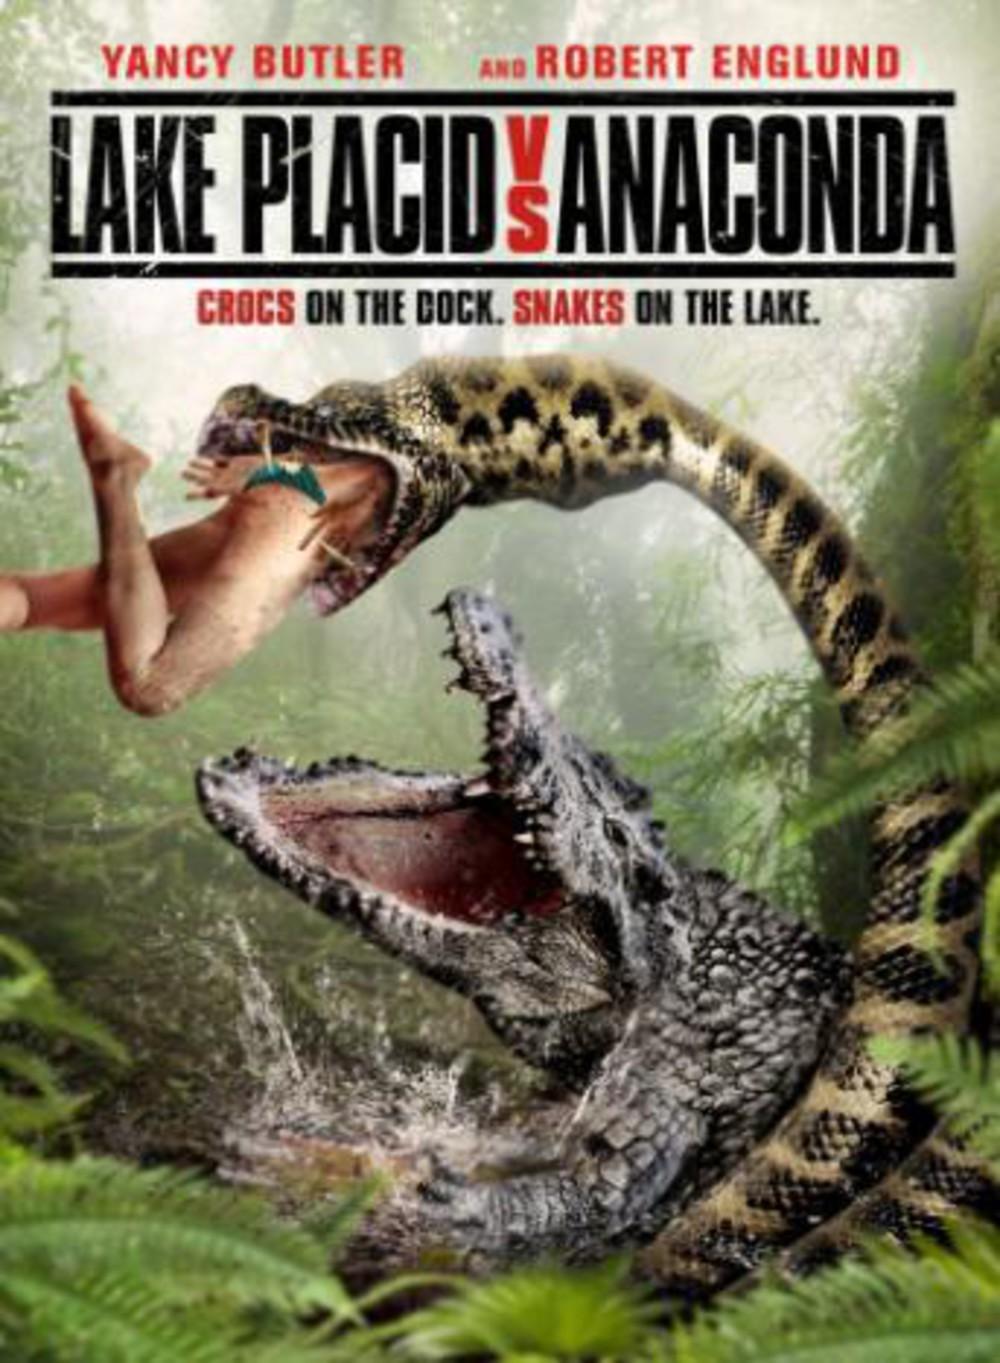 Anaconda Vs Lake Placid Full Movie trashdrome: 127 lake placid vs anaconda